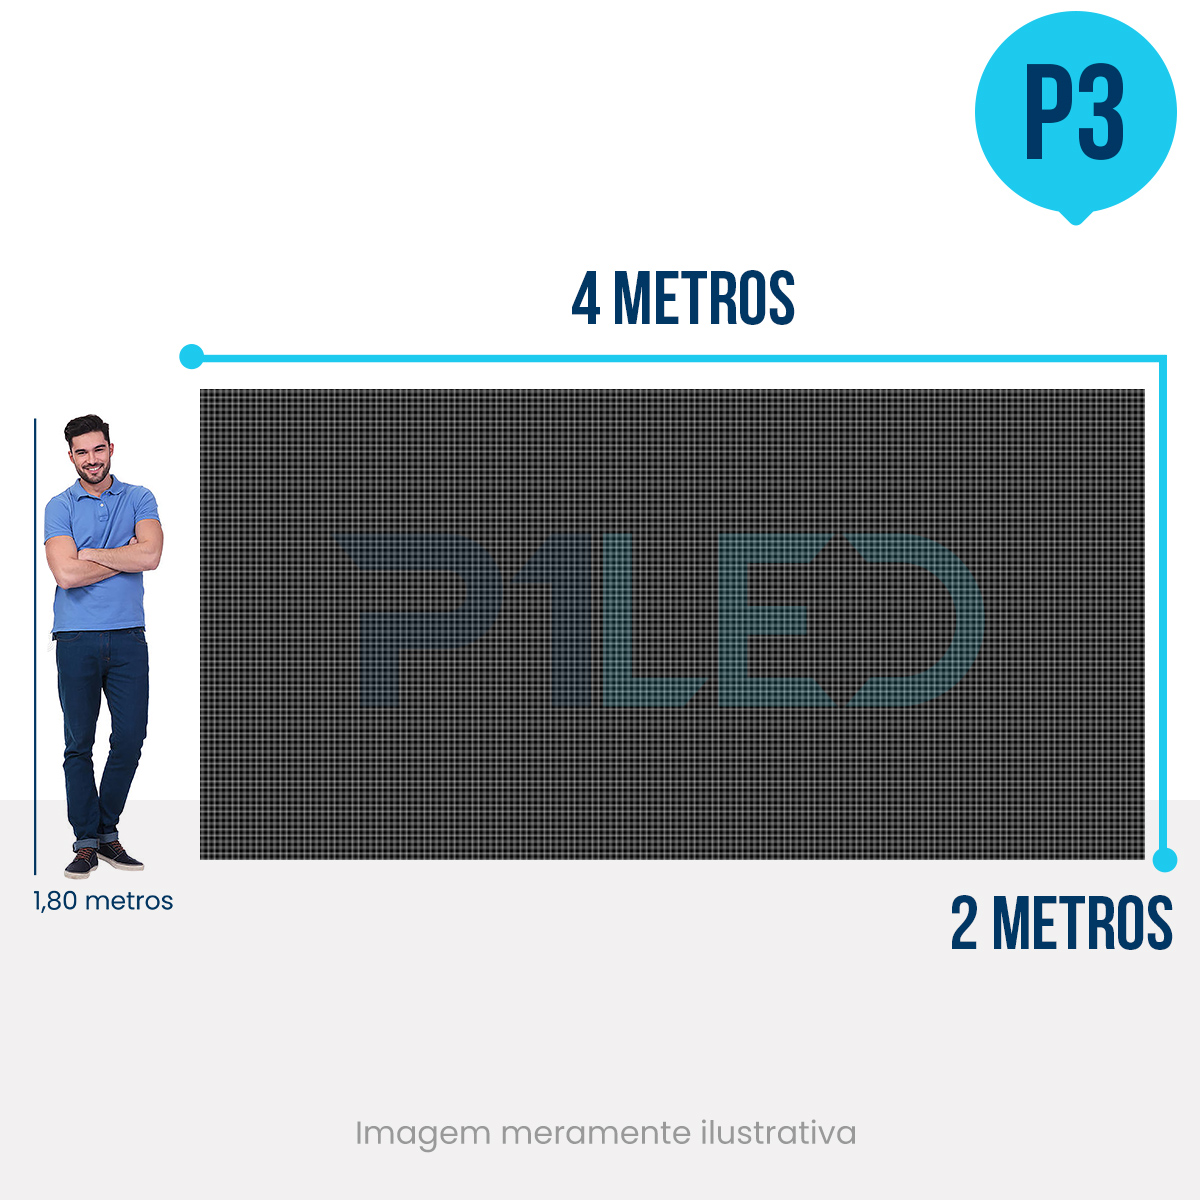 Painel de LED para Vitrine 4x2 - Telão P3 Outdoor  - Painel e Telão de LED - O Melhor Preço em Painel de LED | P1LED